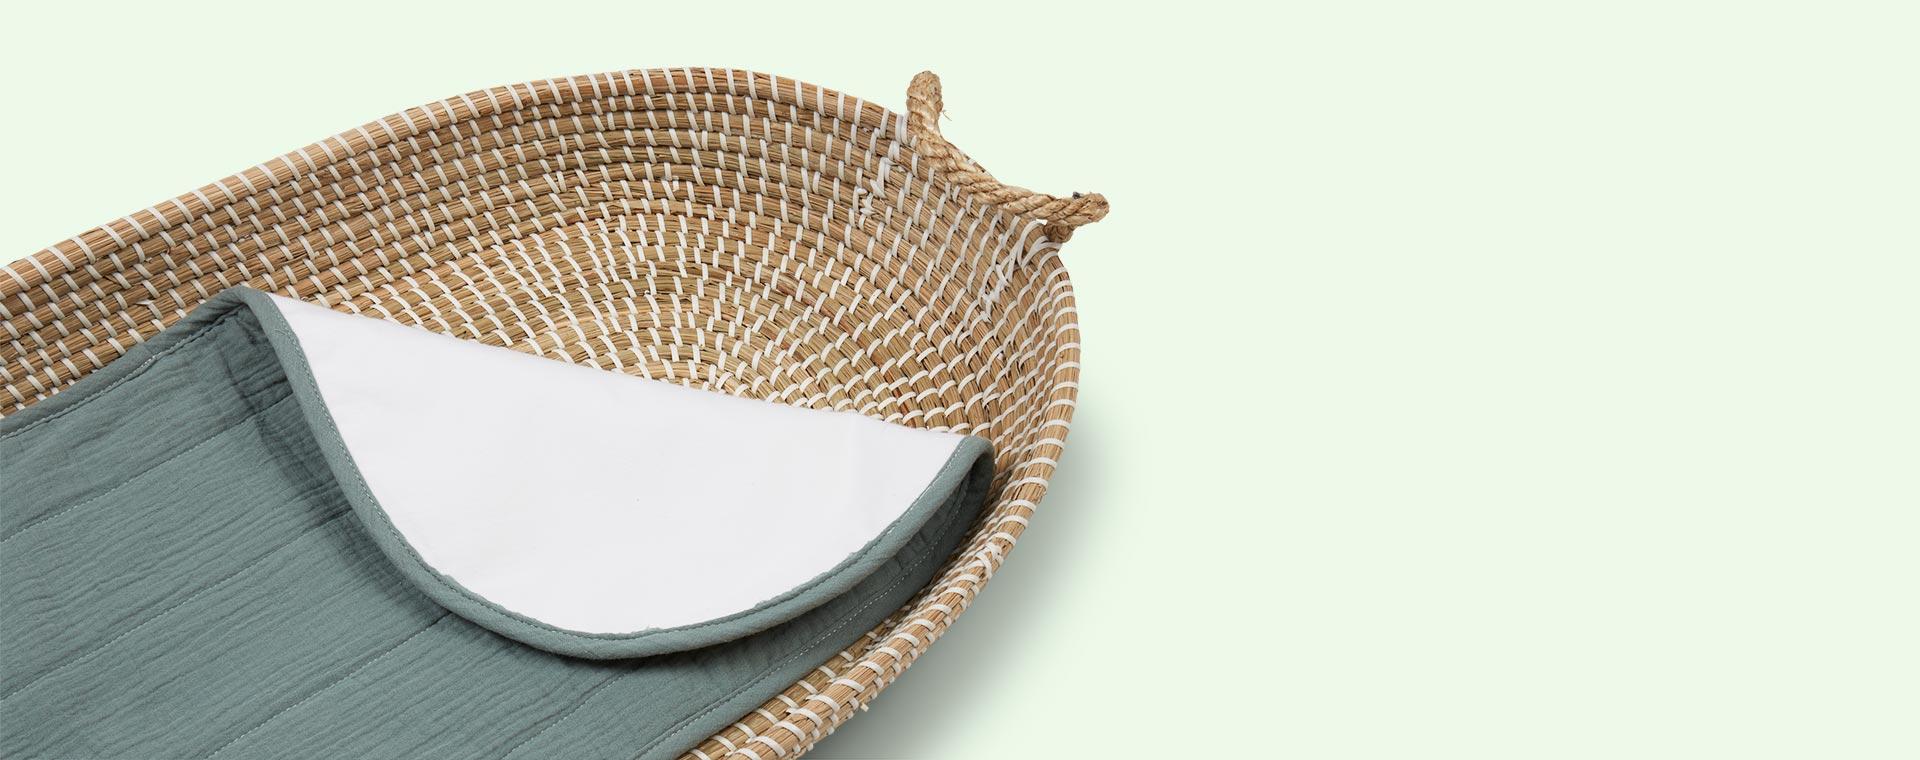 Sage Olli Ella Changing Basket Cotton Insert - Luxury